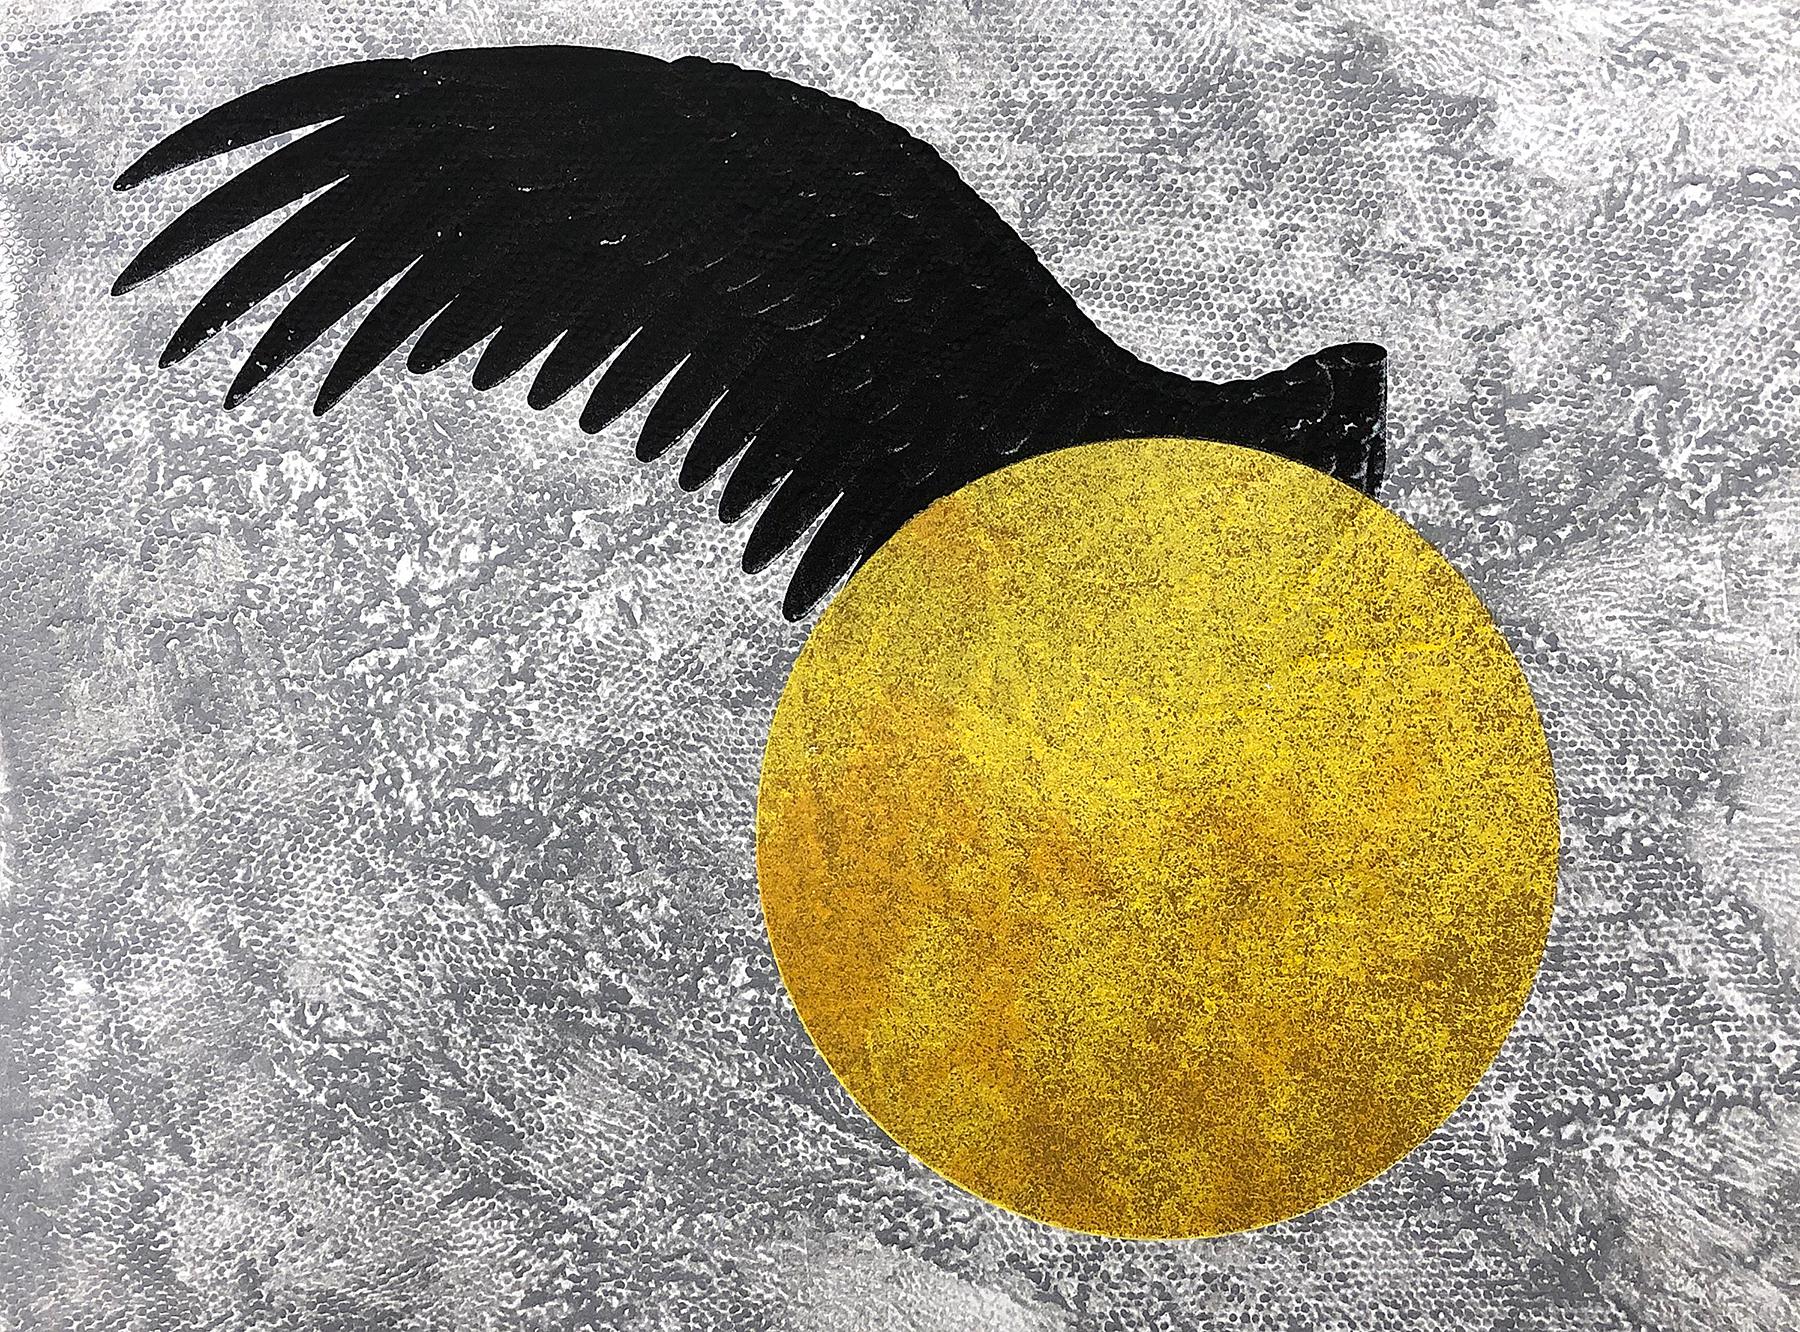 "Icarus - Noelle Olsen, 2020, collagraph / screenprint, 20 x 15"""